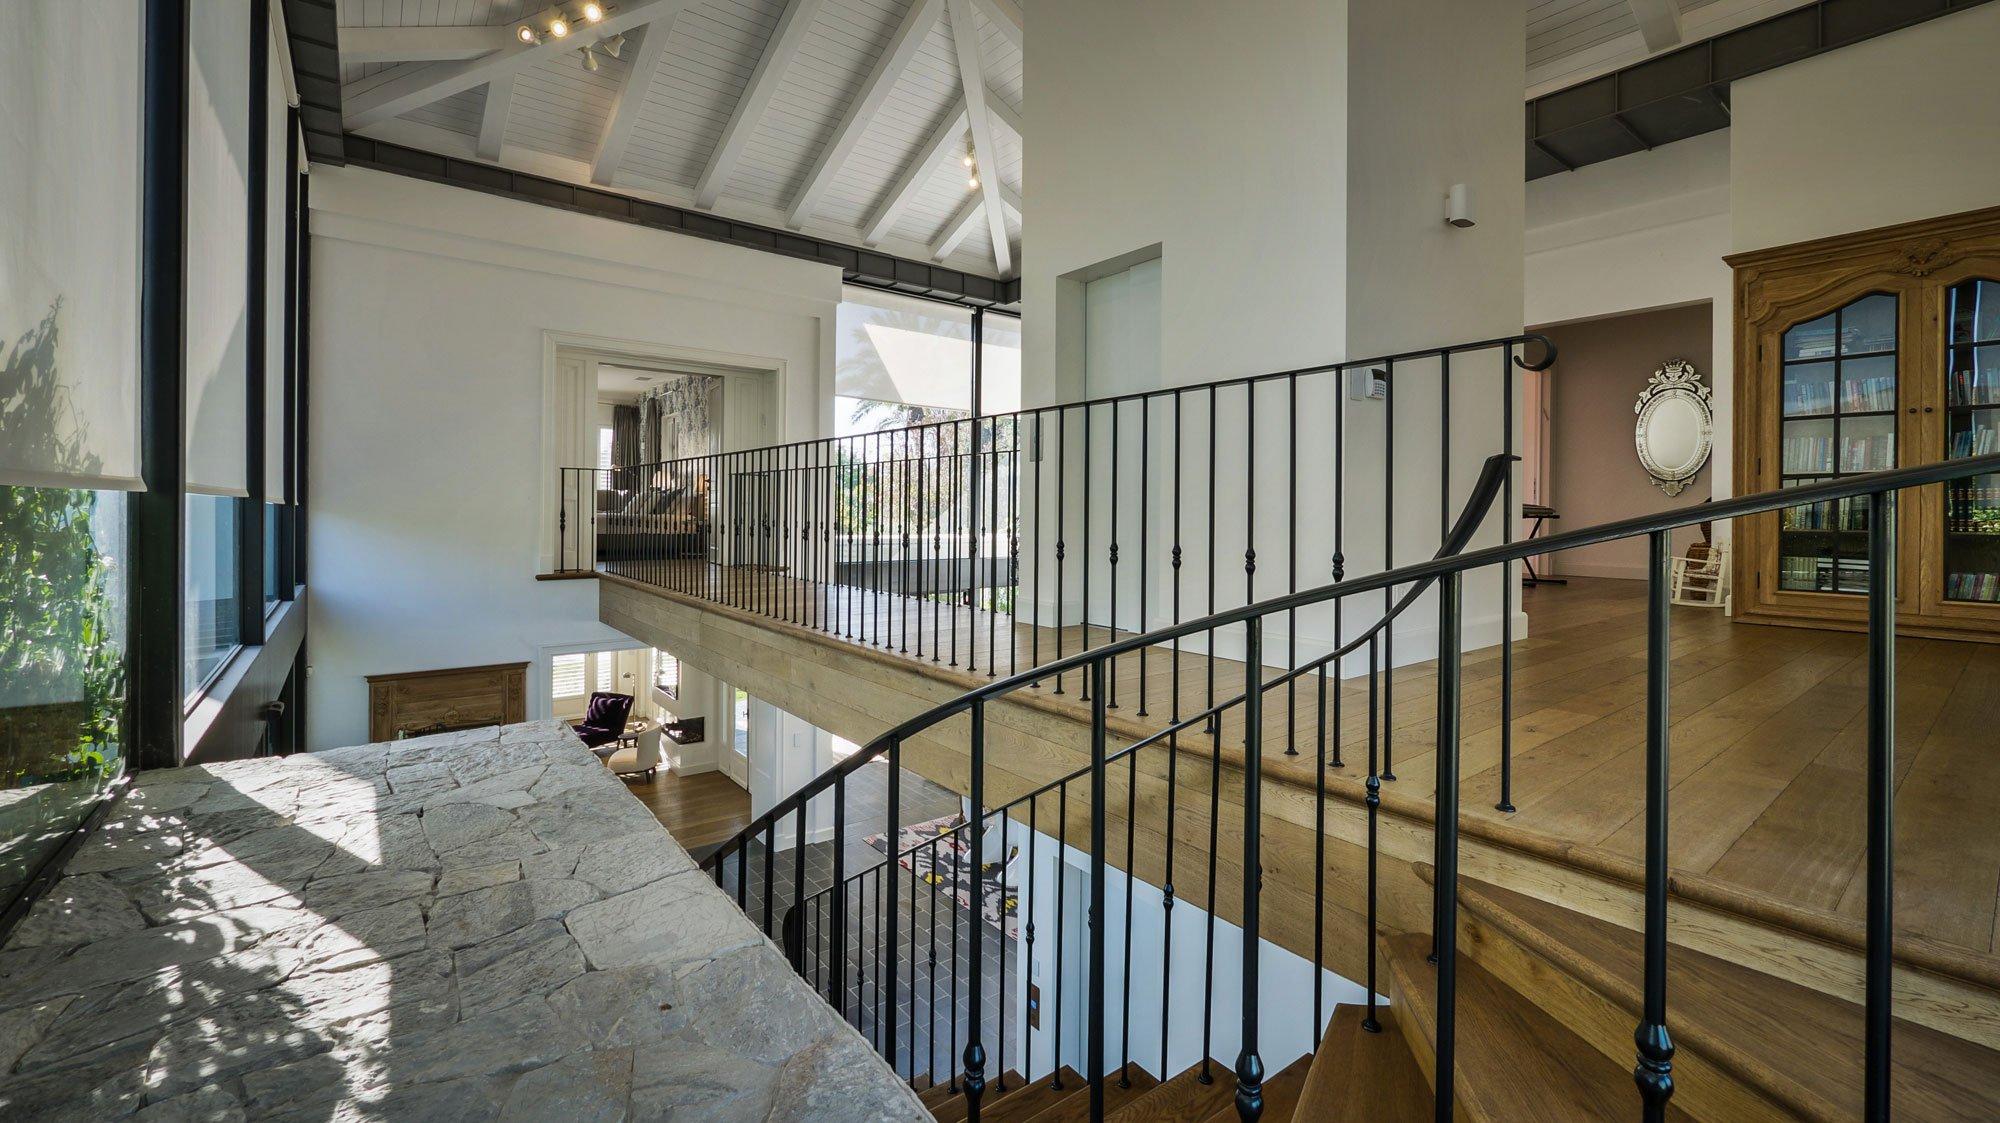 Home-in-Herzlia-Pituach-17